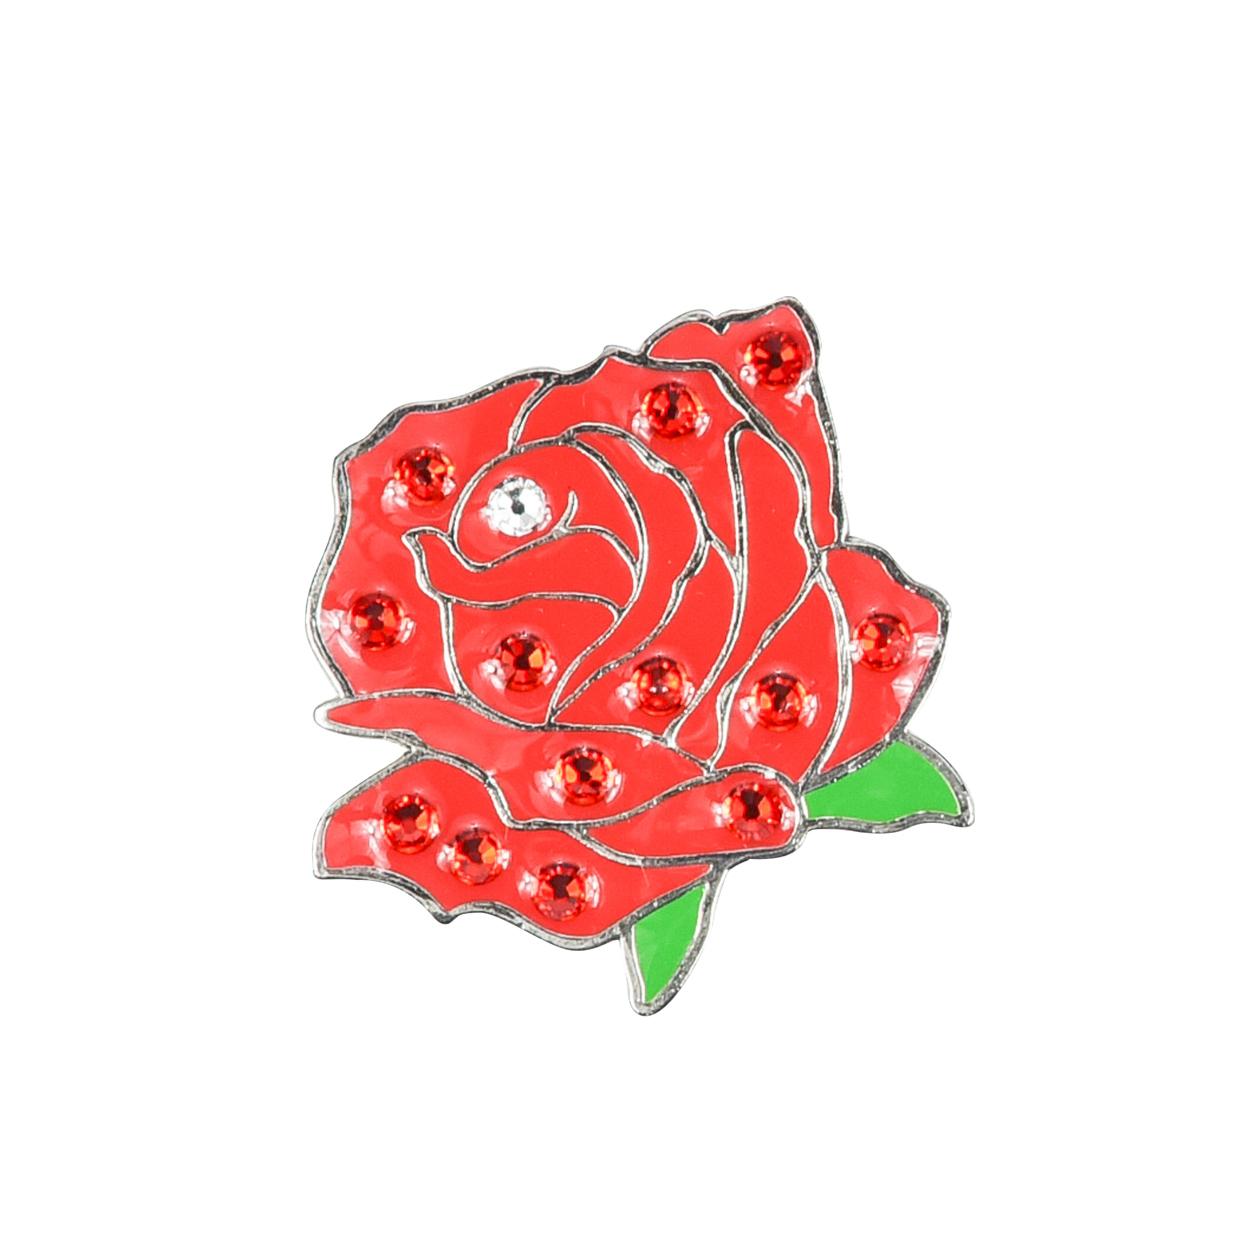 9. Rose Red